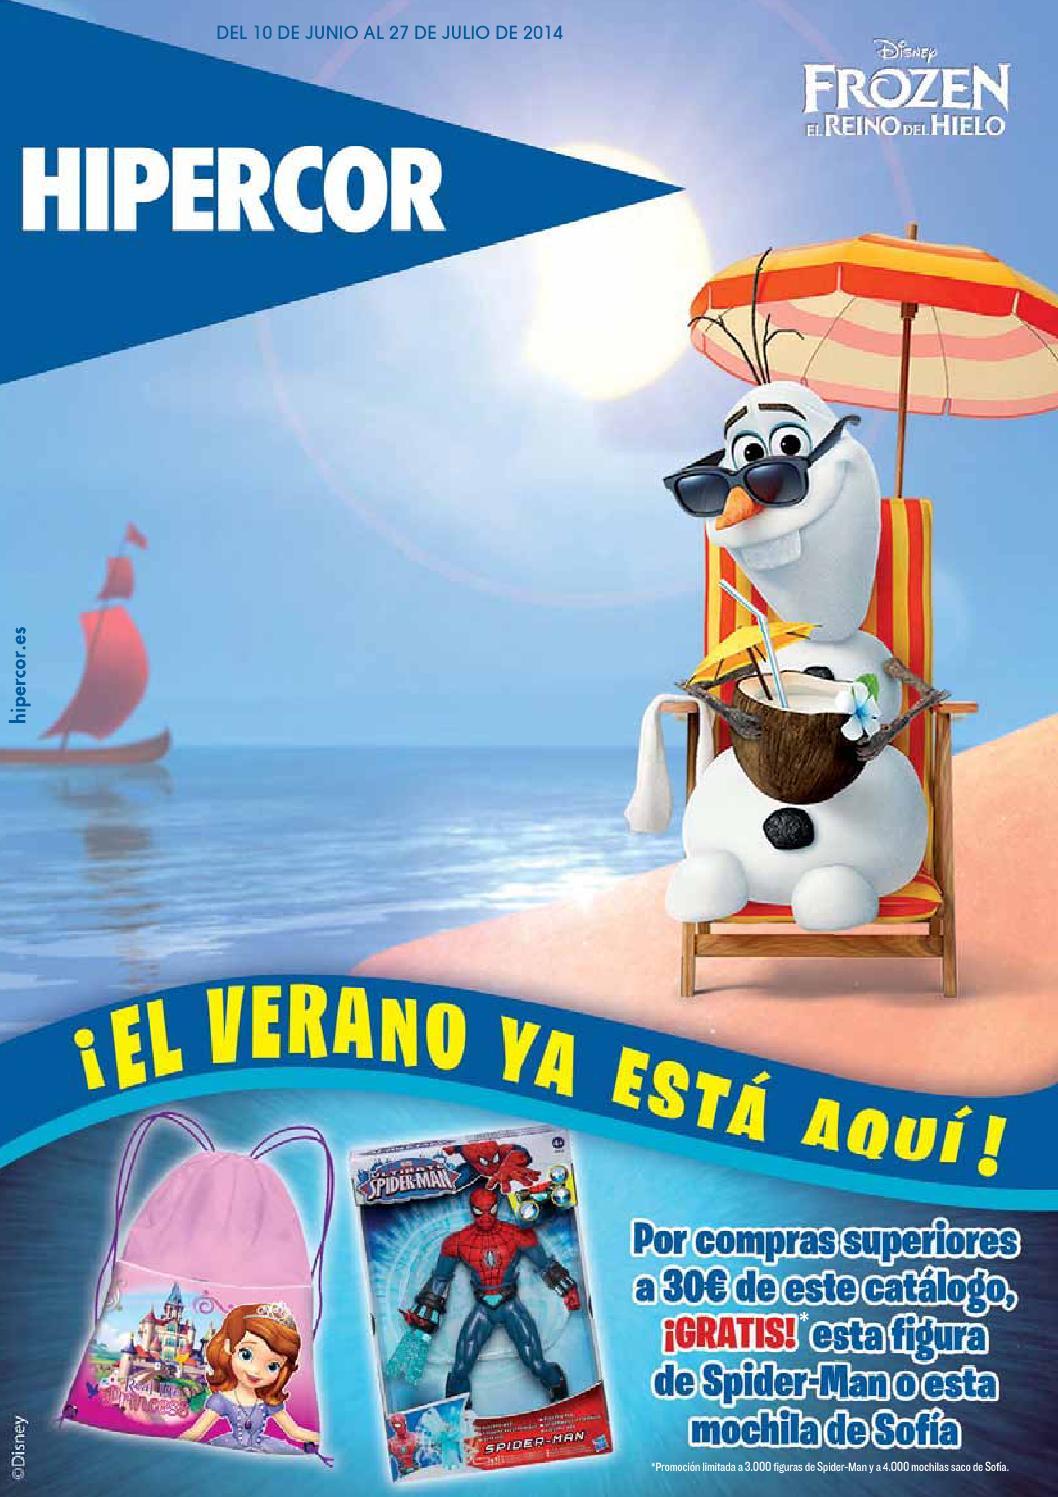 Hipercor El Verano ya Está Aquí! by André Gonçalves   issuu